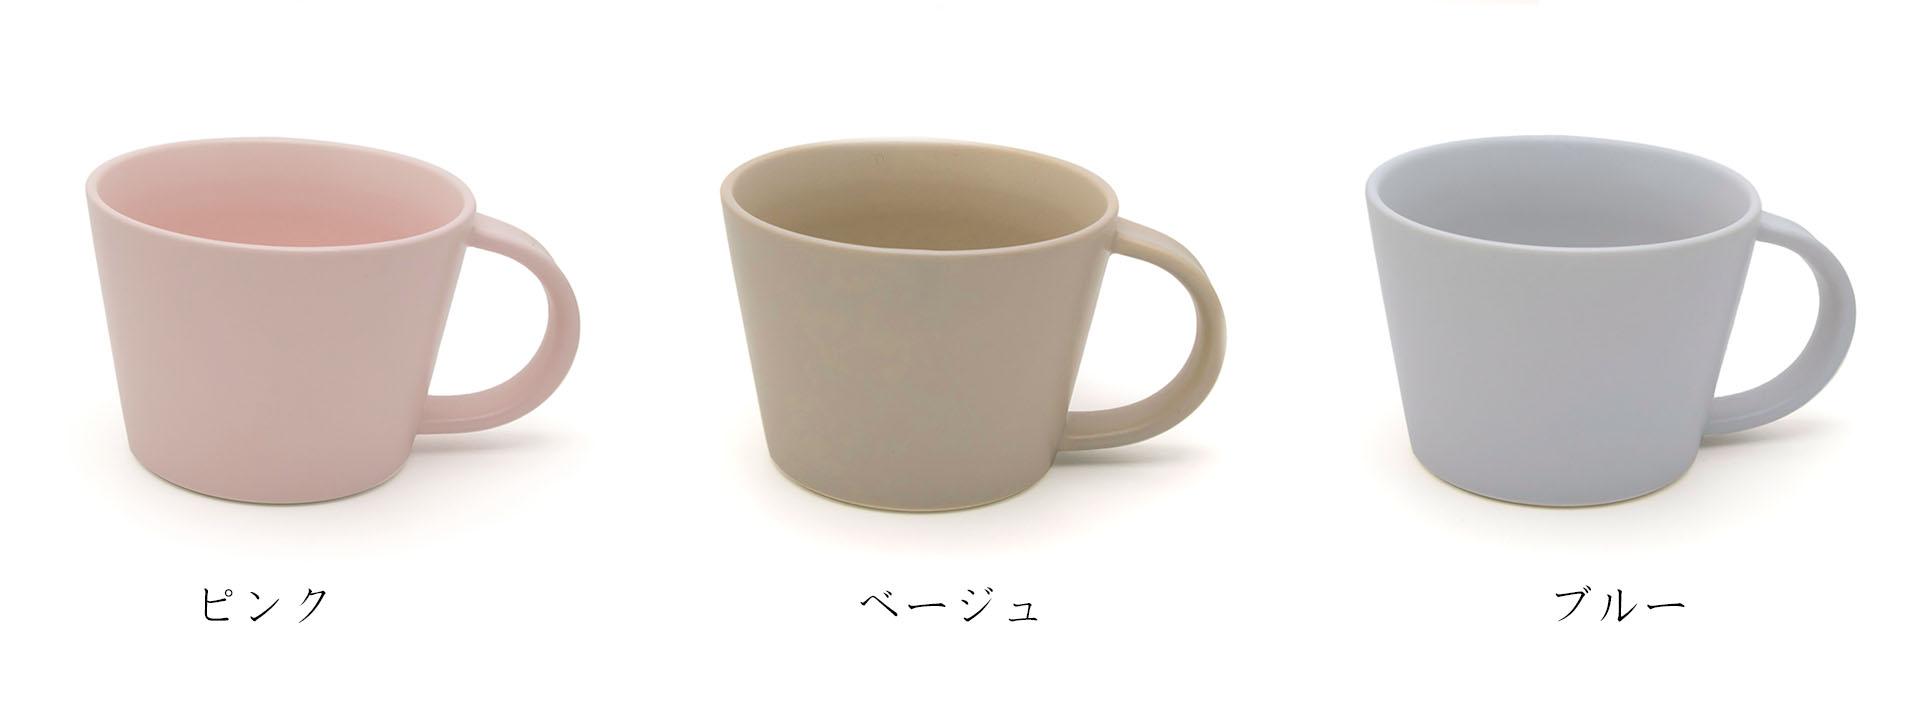 m.m.d. / マグ / 瀬戸焼